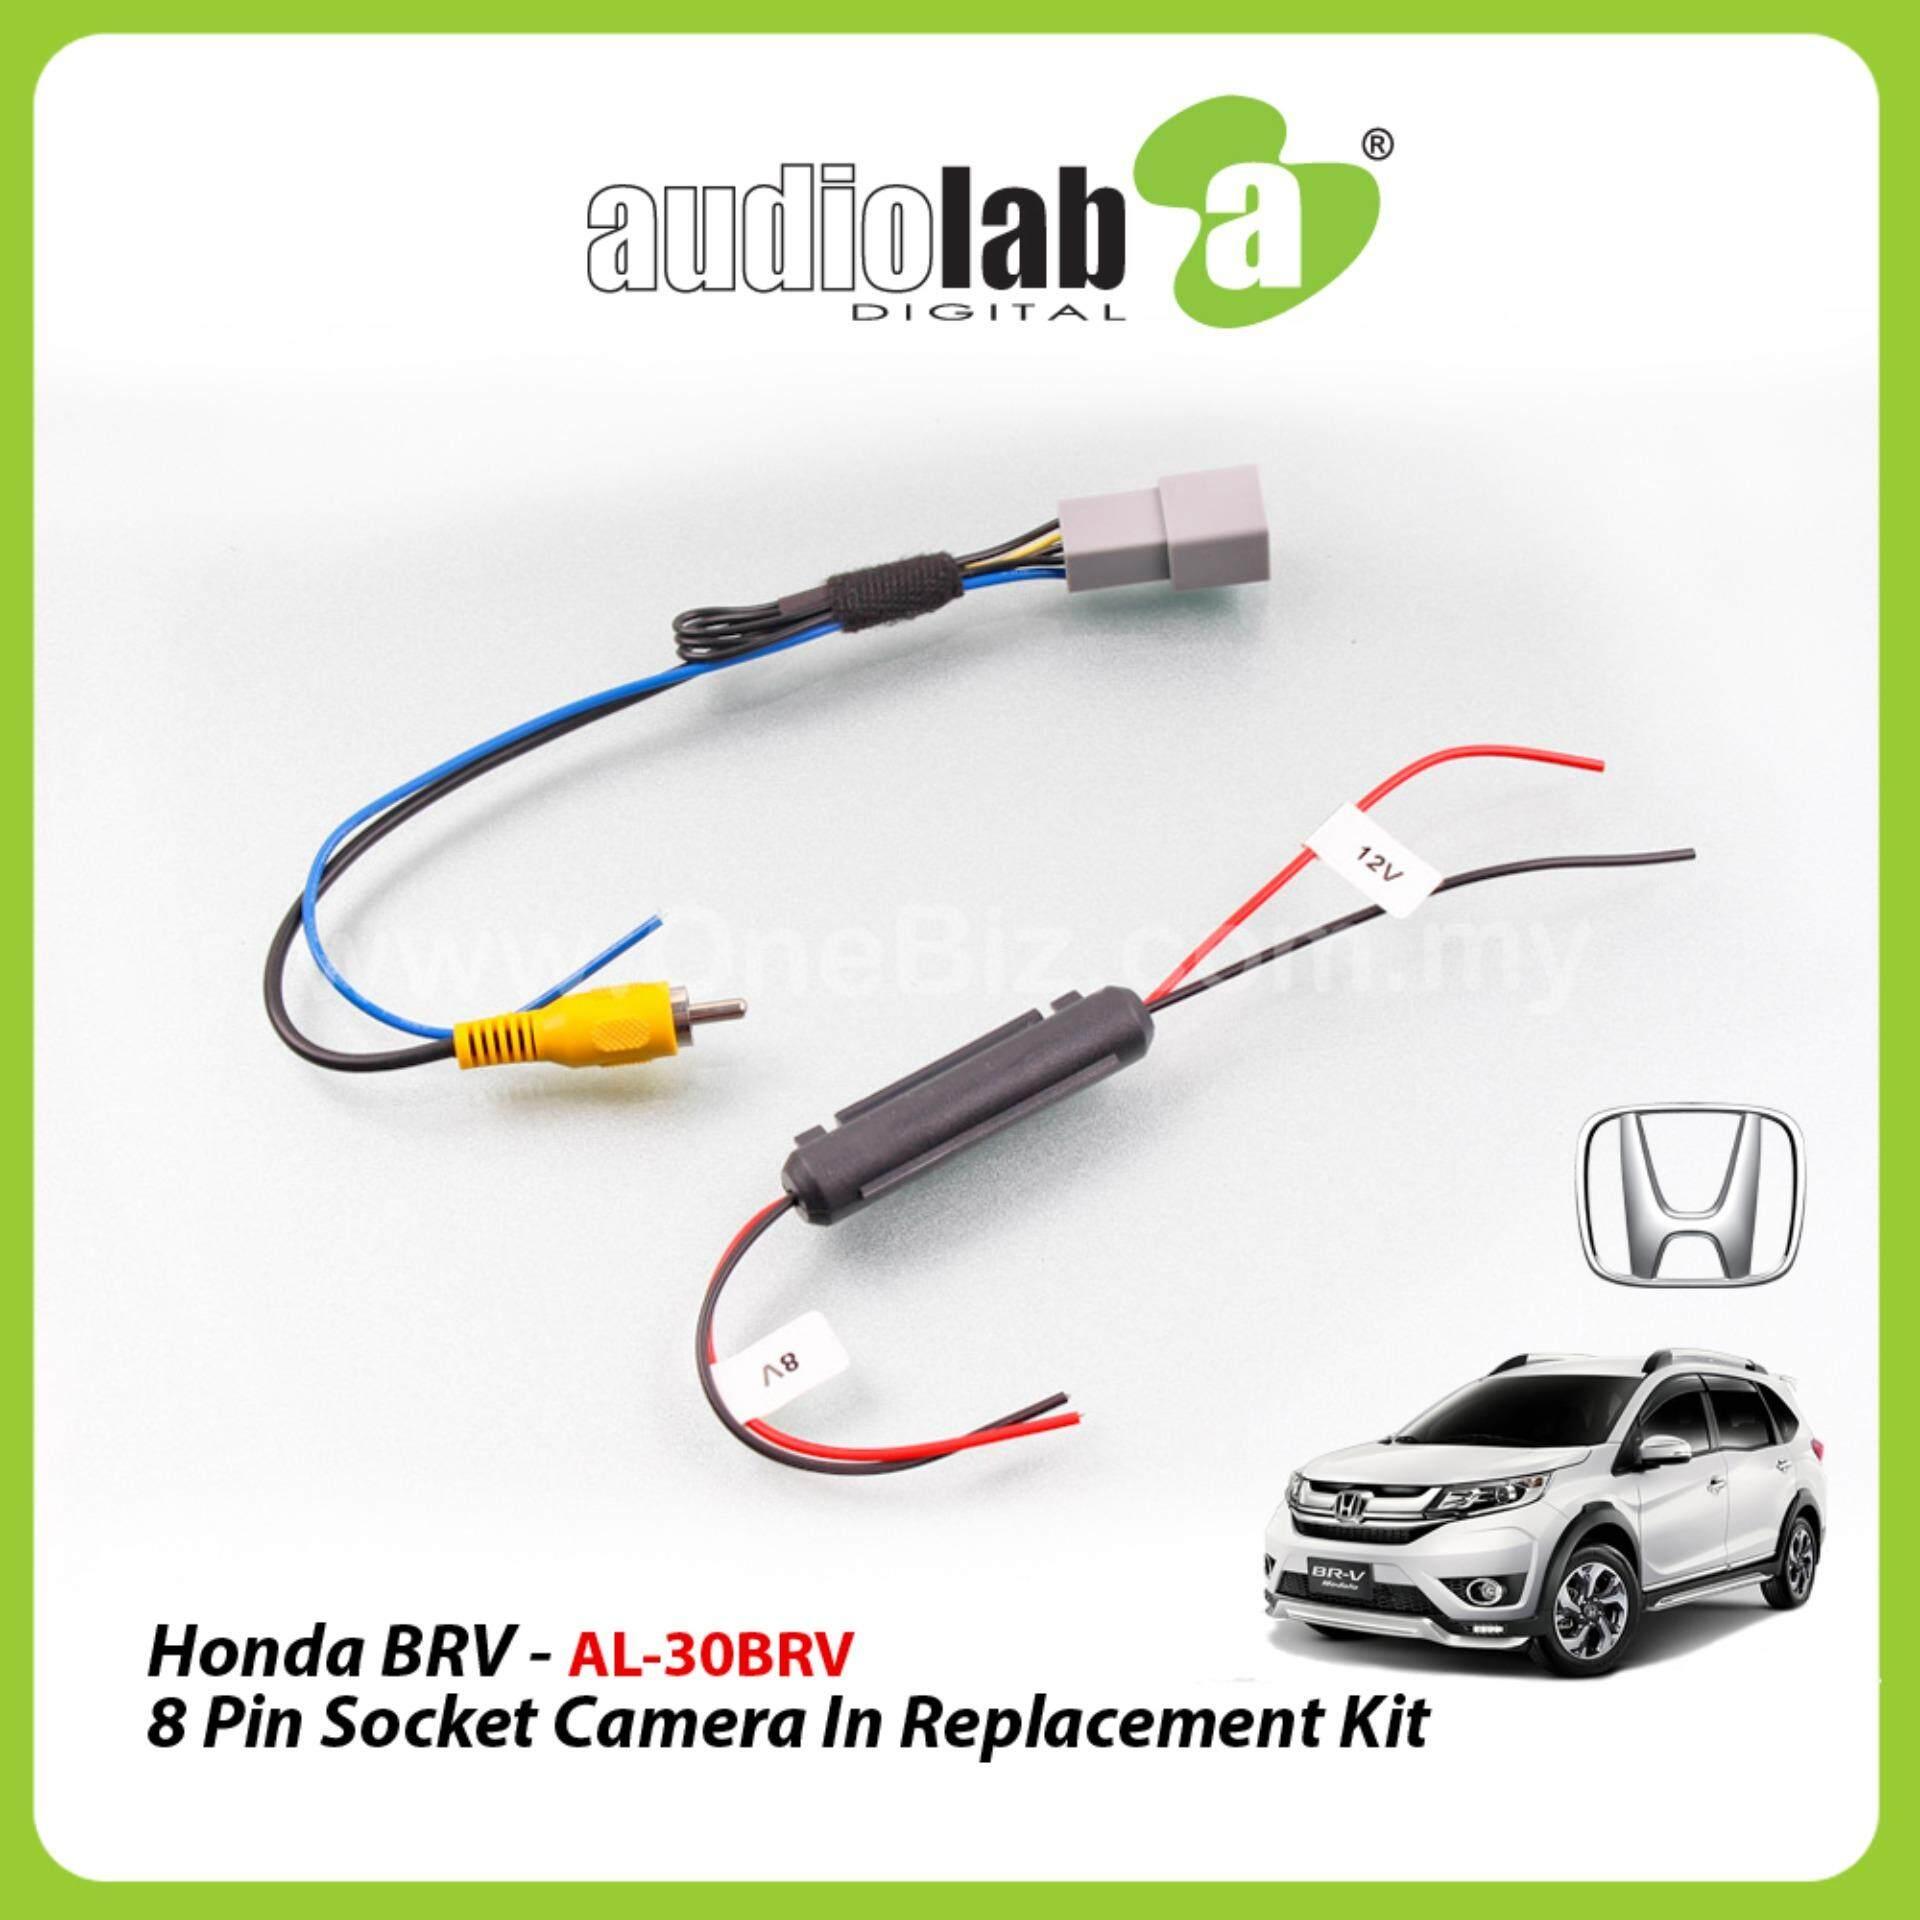 hight resolution of audiolab honda brv 8pin socket camera in replacement kit al 30brv